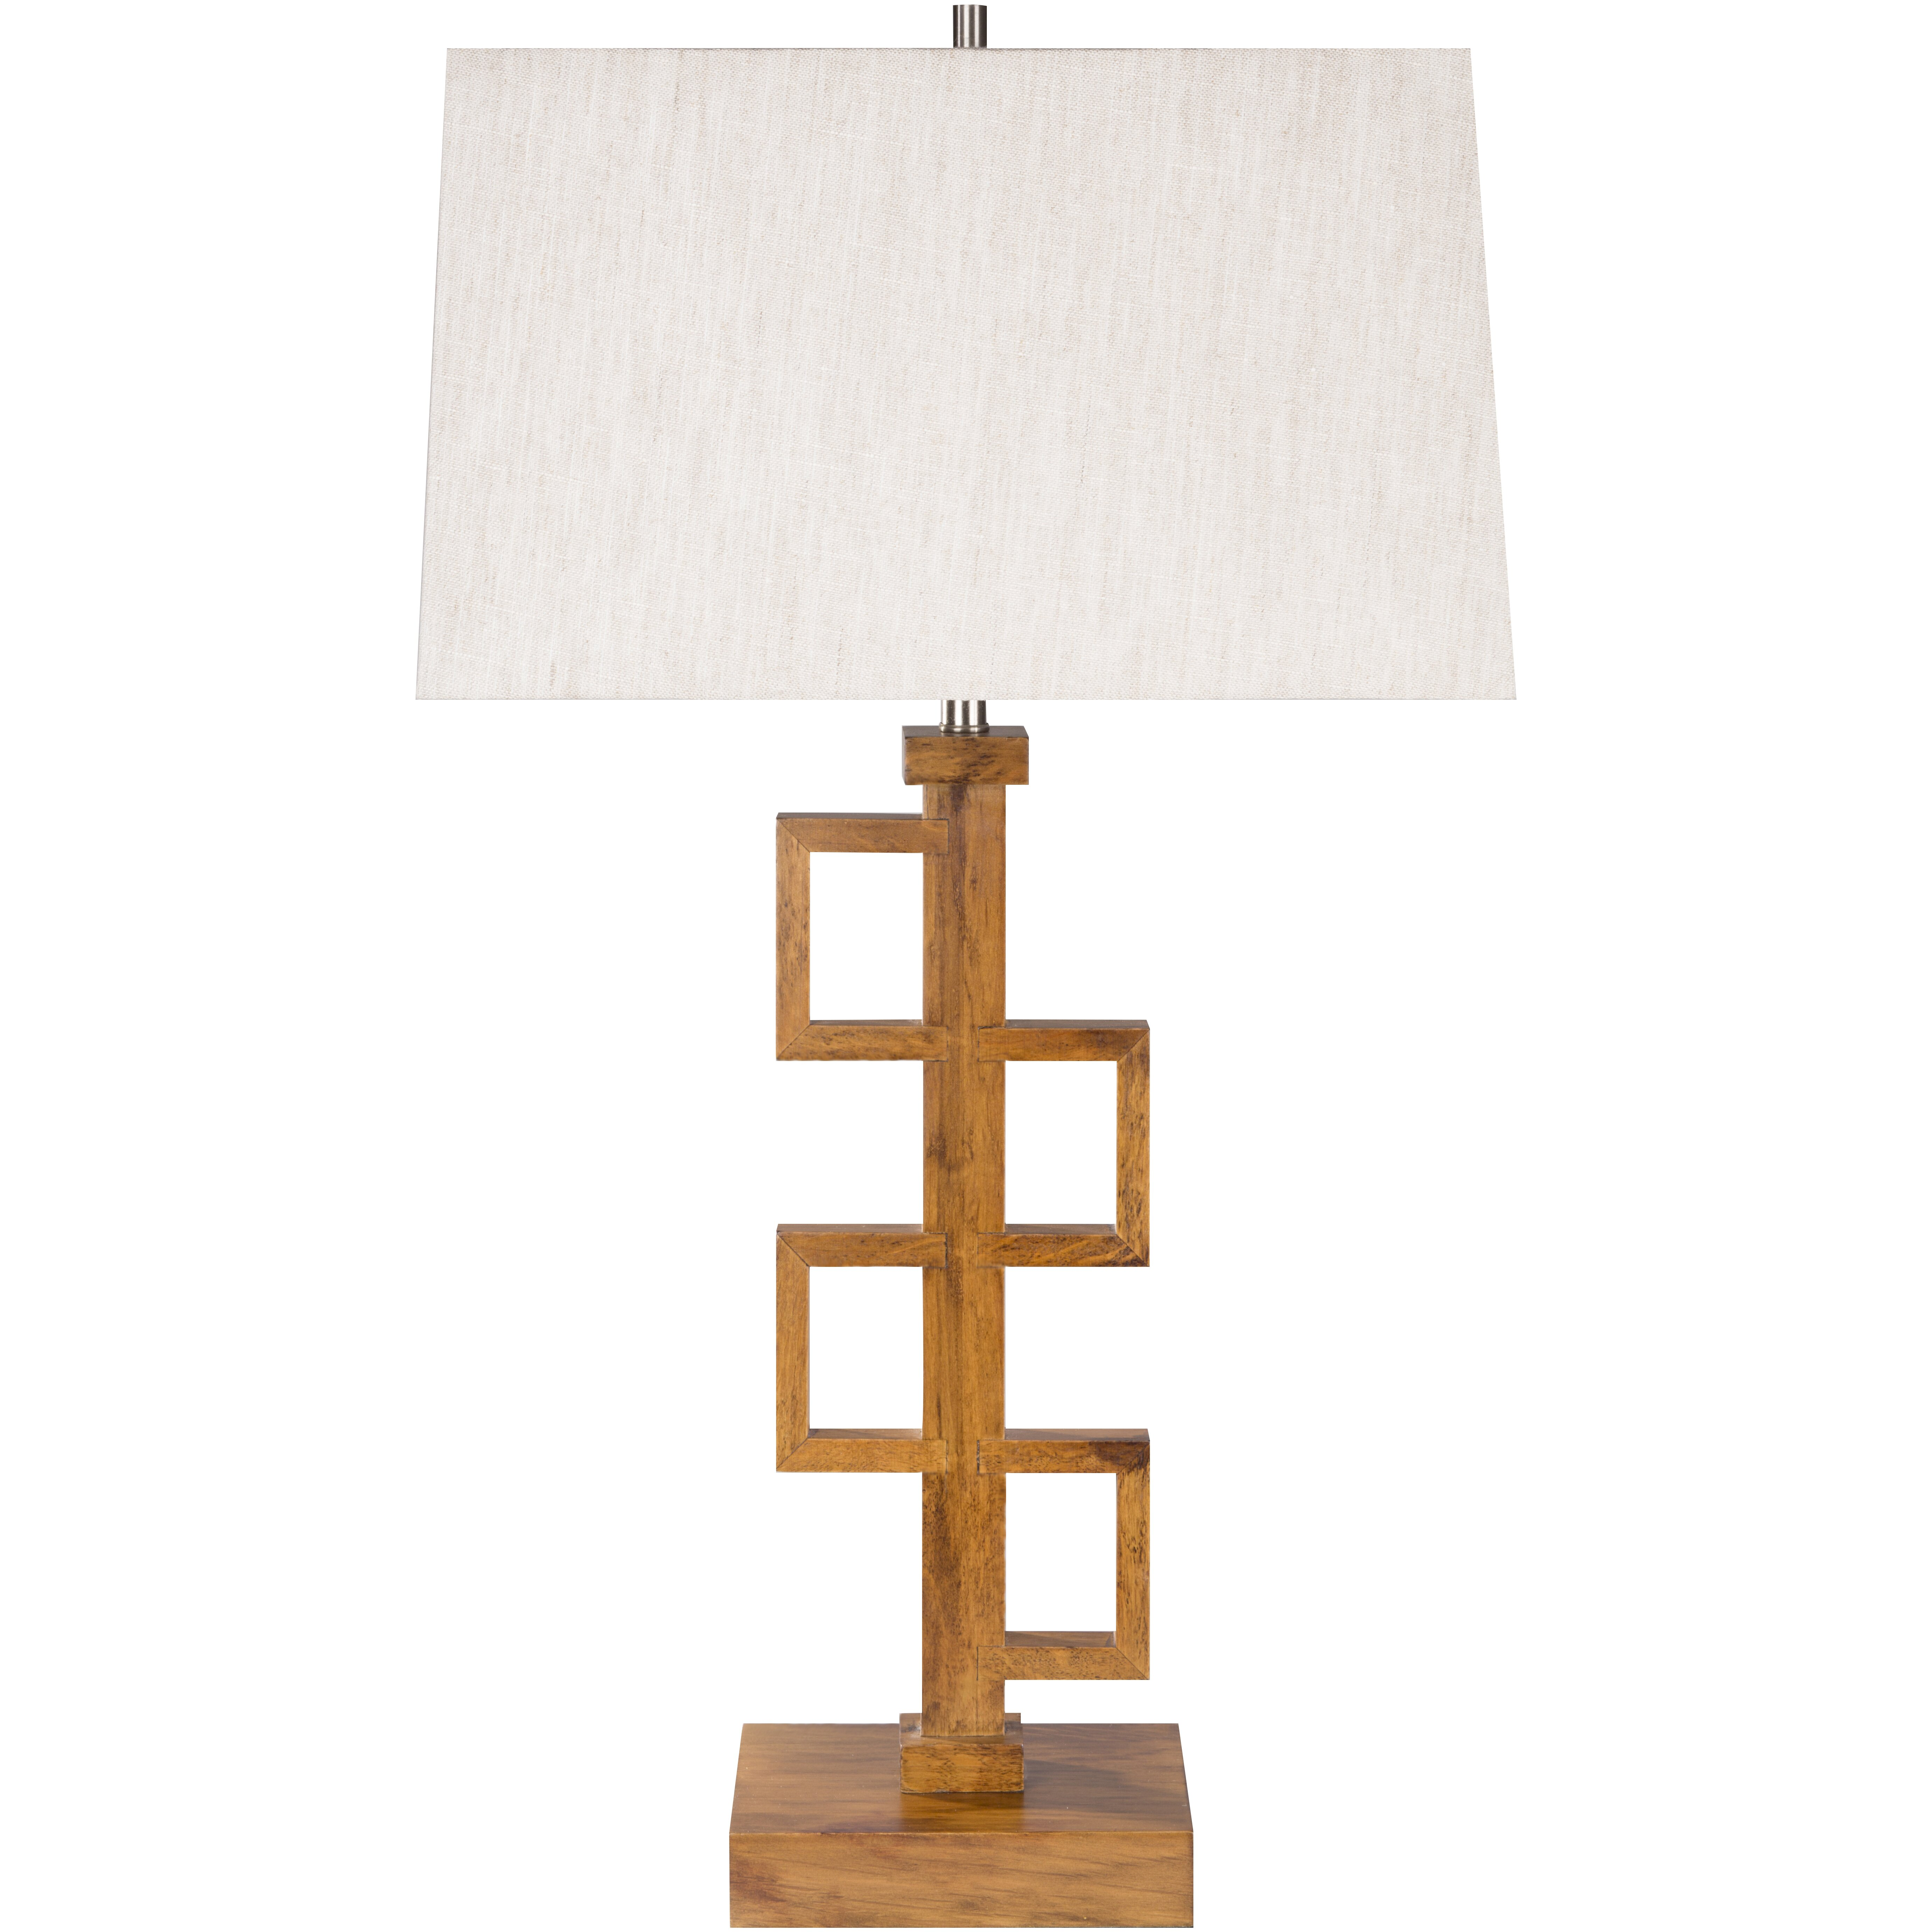 lighting lamps table lamps surya sku ya47035. Black Bedroom Furniture Sets. Home Design Ideas